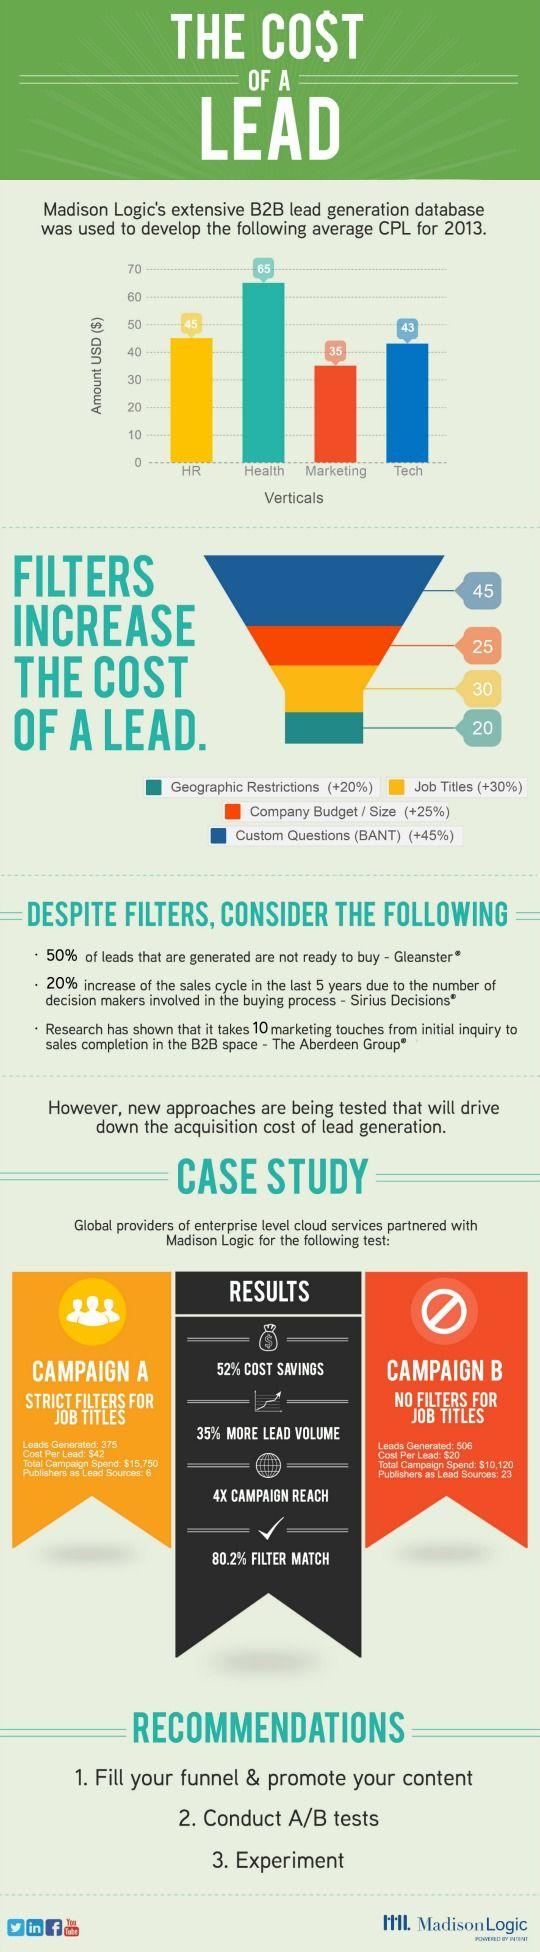 B2B Lead Generation Cost   content marketing : funnels   infographic : 1   ram2013